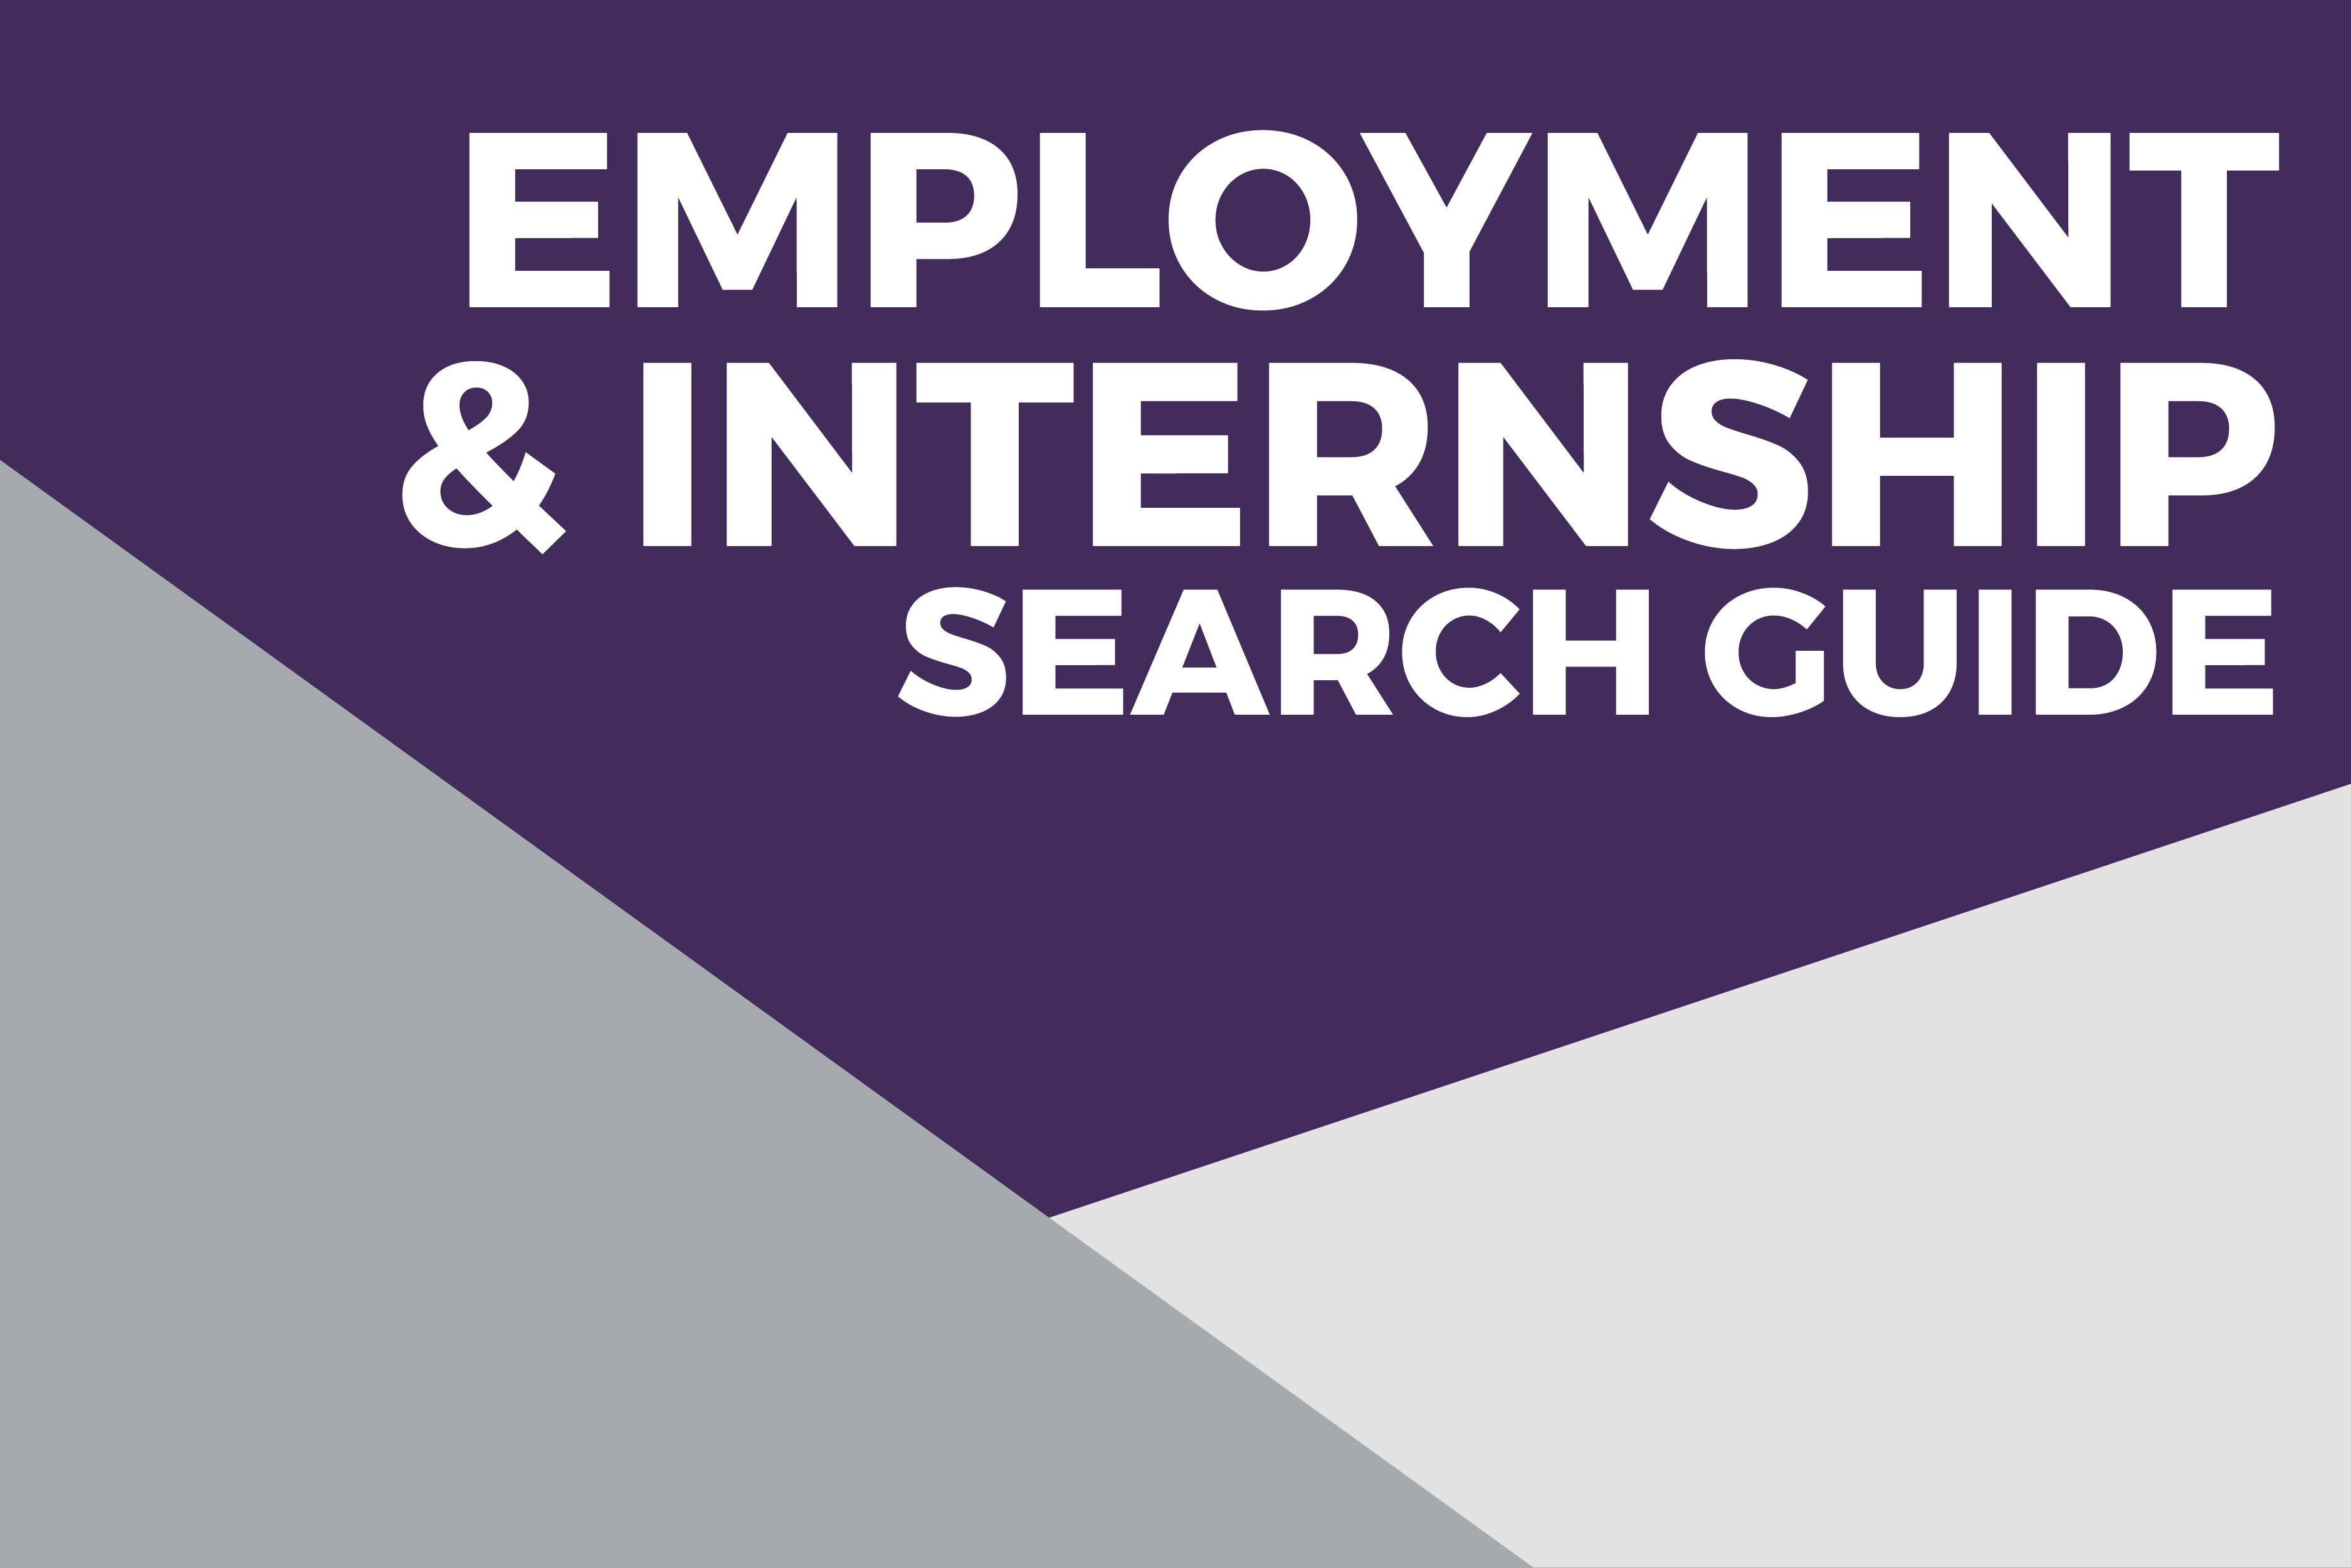 Employment & internship search guide